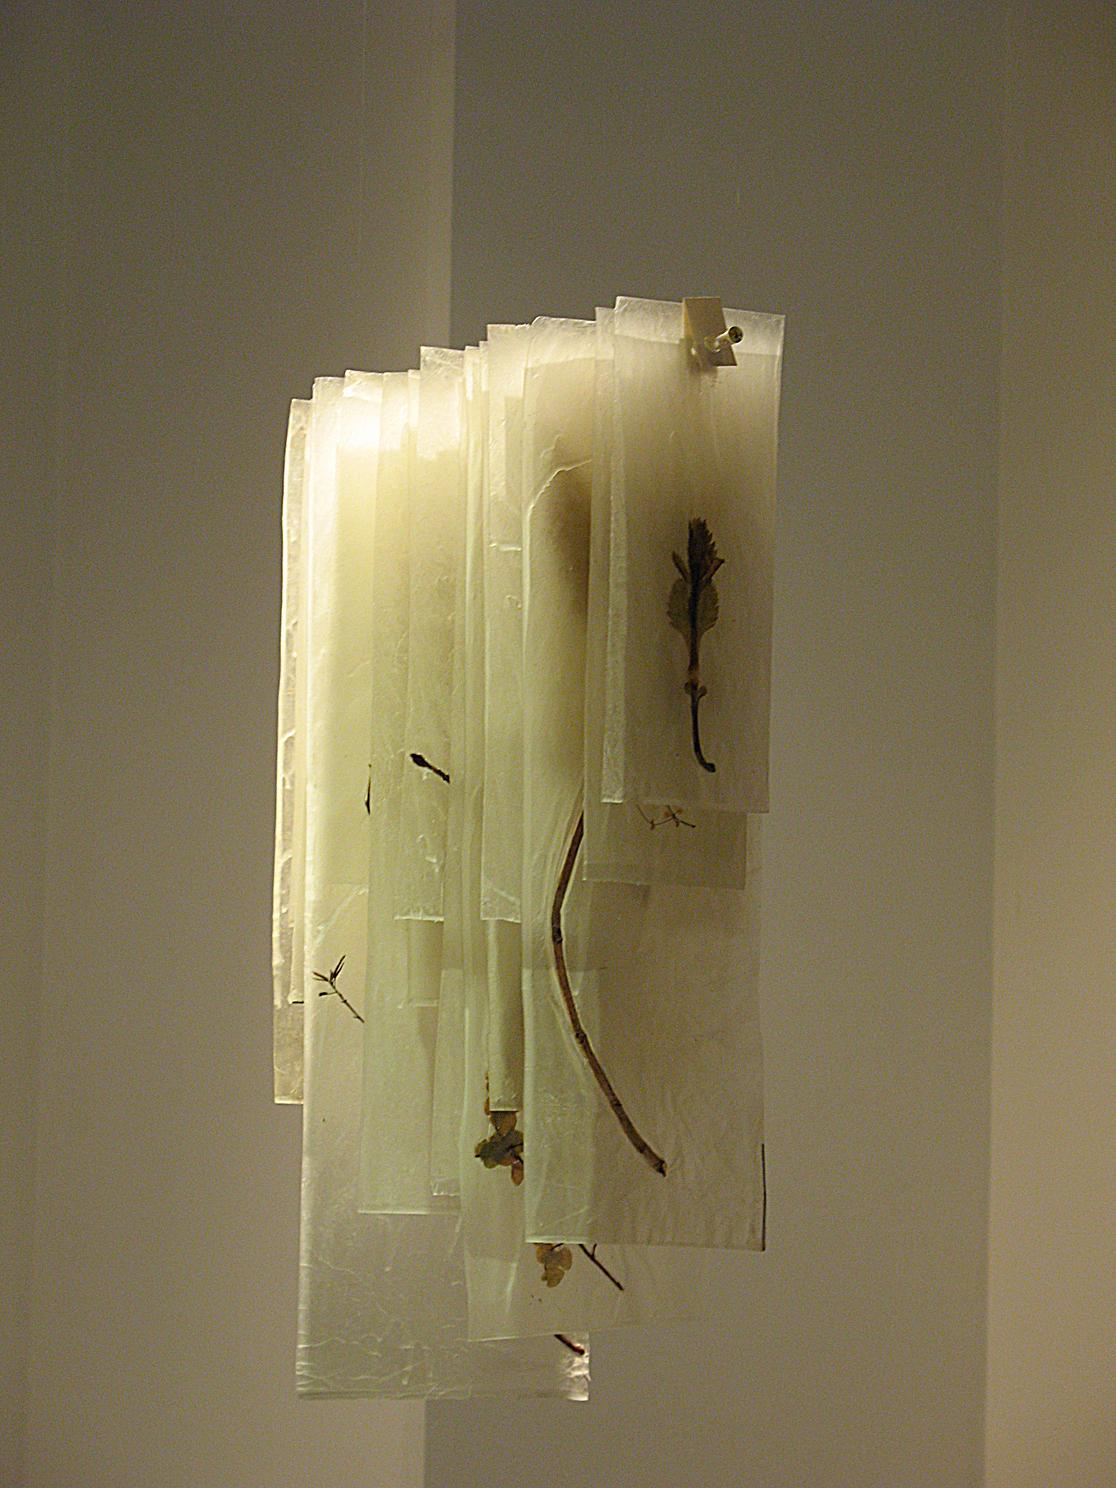 ADACHI Ryoko - book art, paper, hanging pages